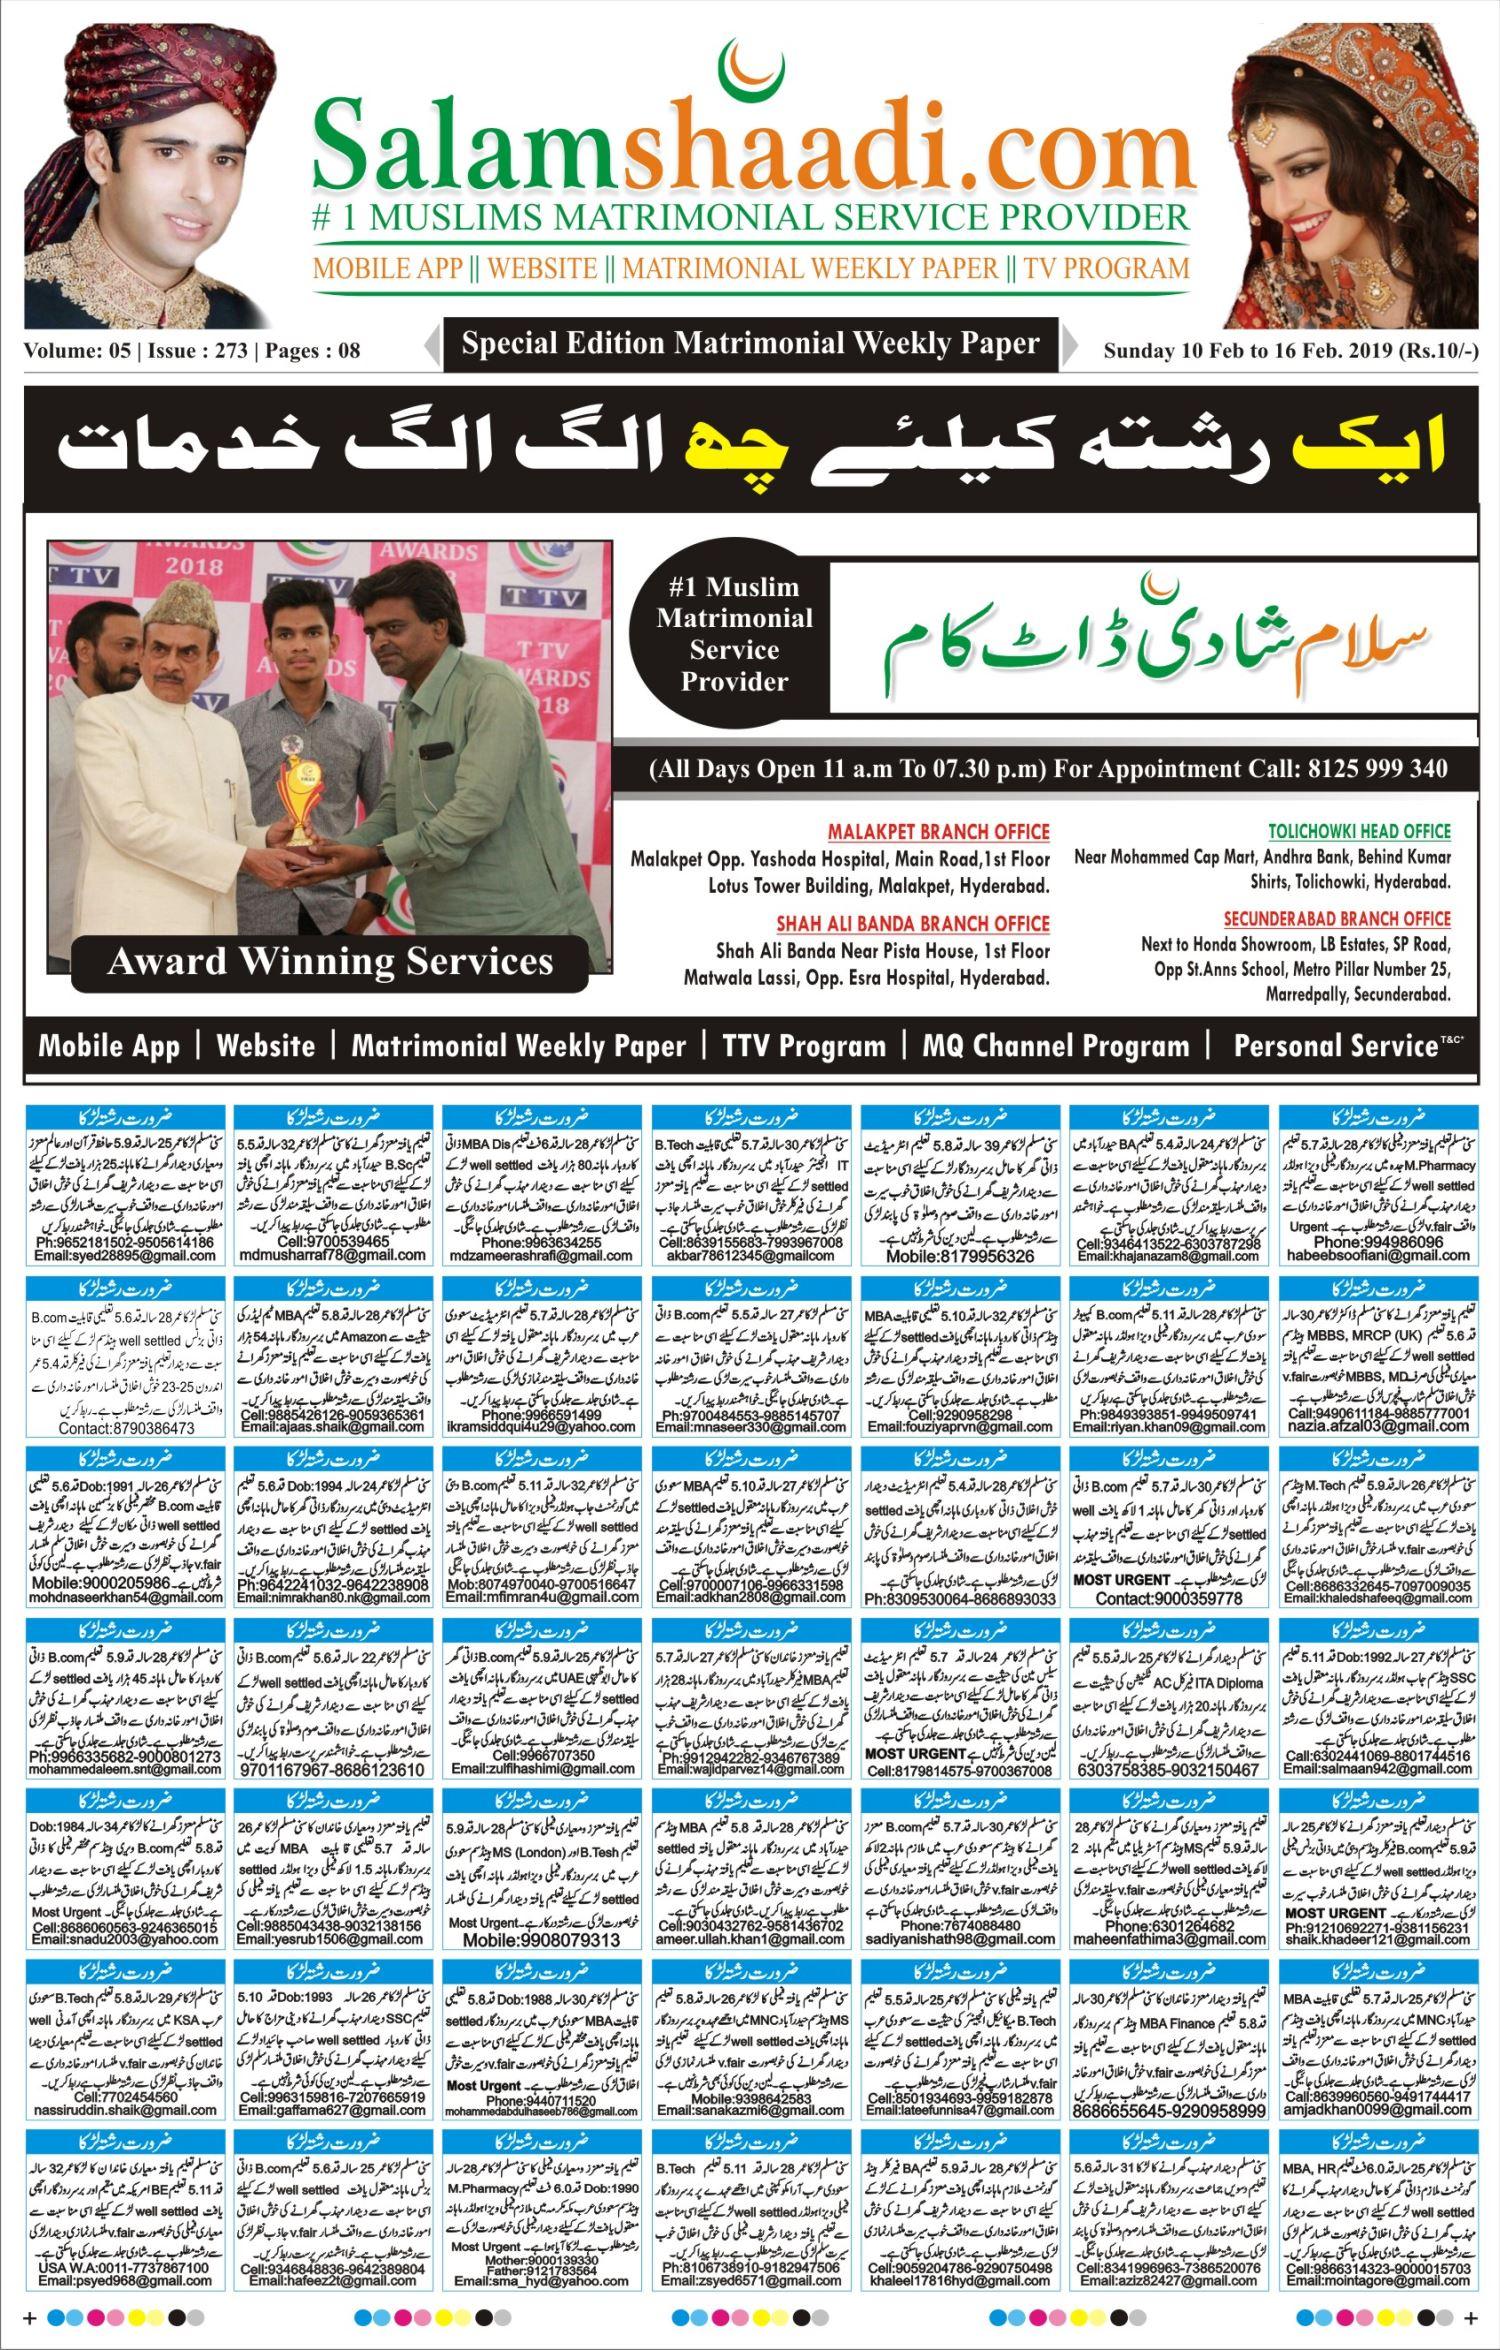 Salam Shaadi   10 Feb 2019 to 16 Feb 2019 Online Matrimonial